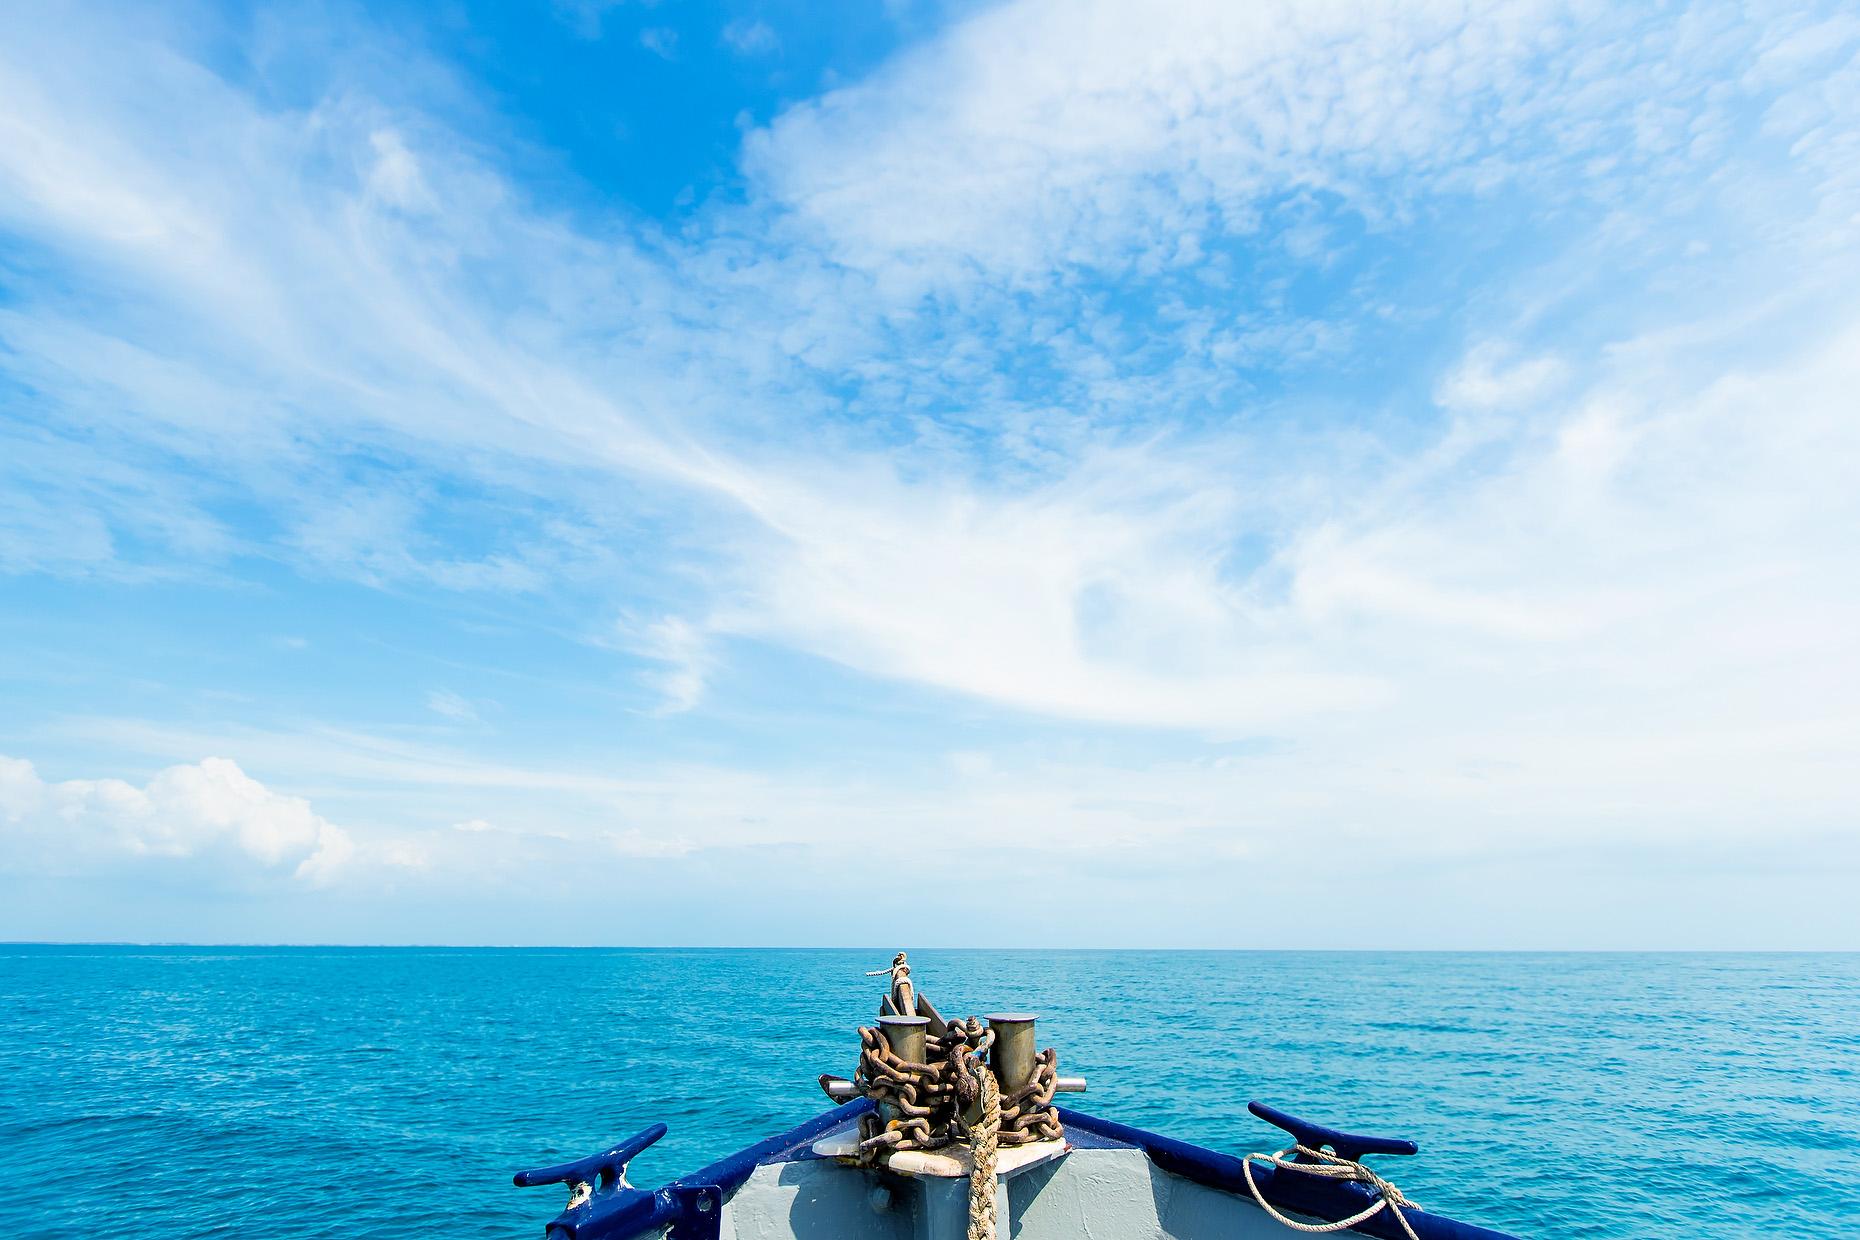 NEW COLLEGE OF FLORIDA SHARK MARINE BIOLOGY 0011.JPG